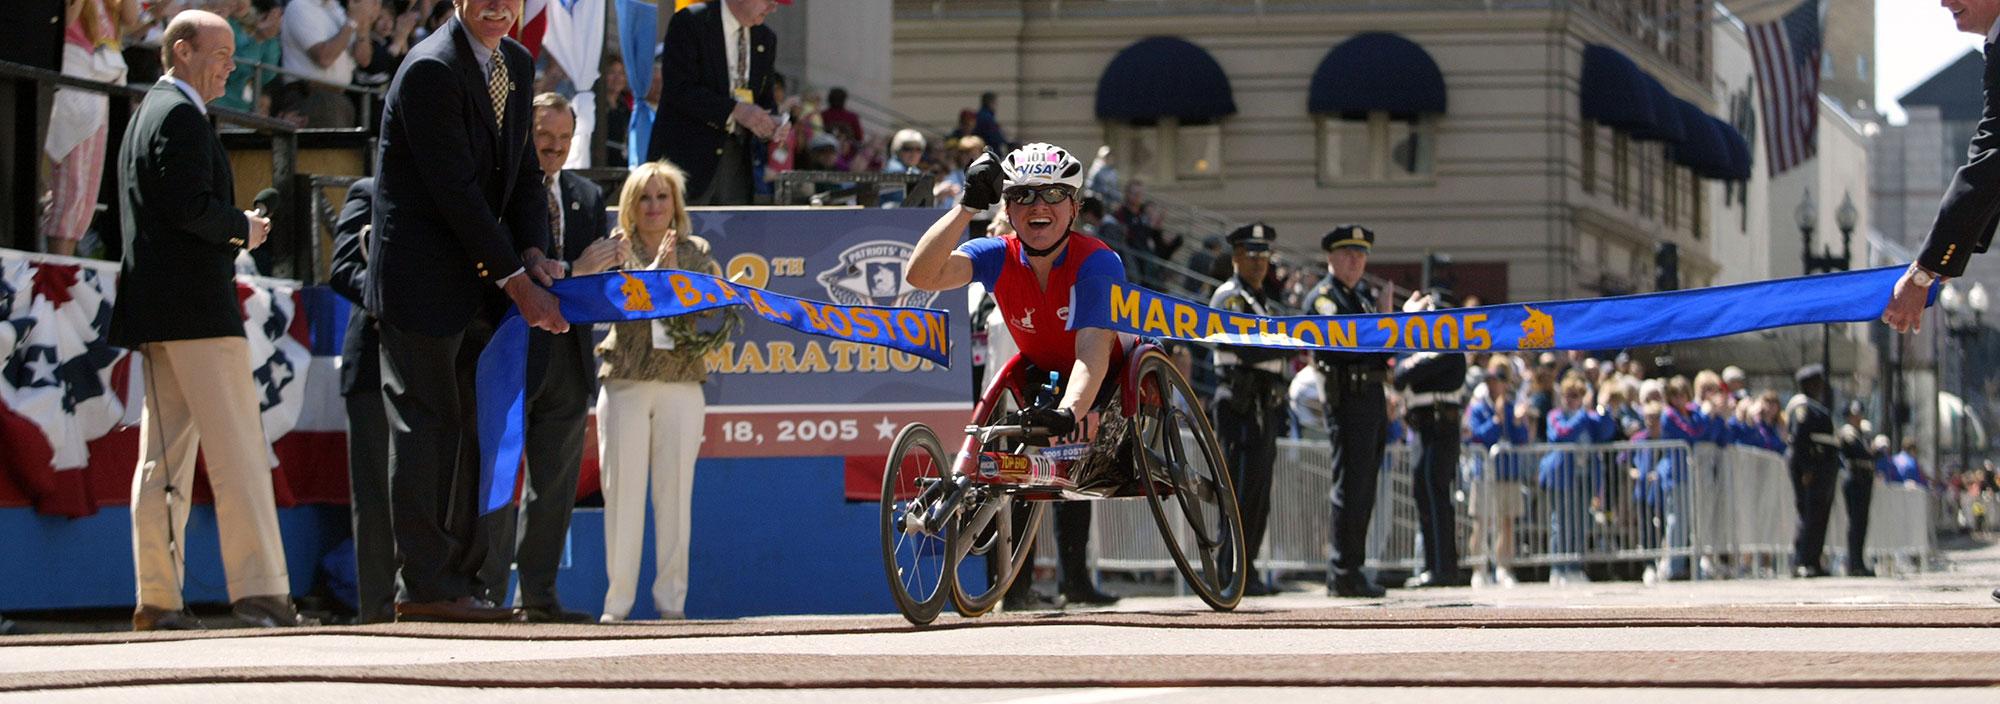 paralympian cheri blauwet boston marathon 2004